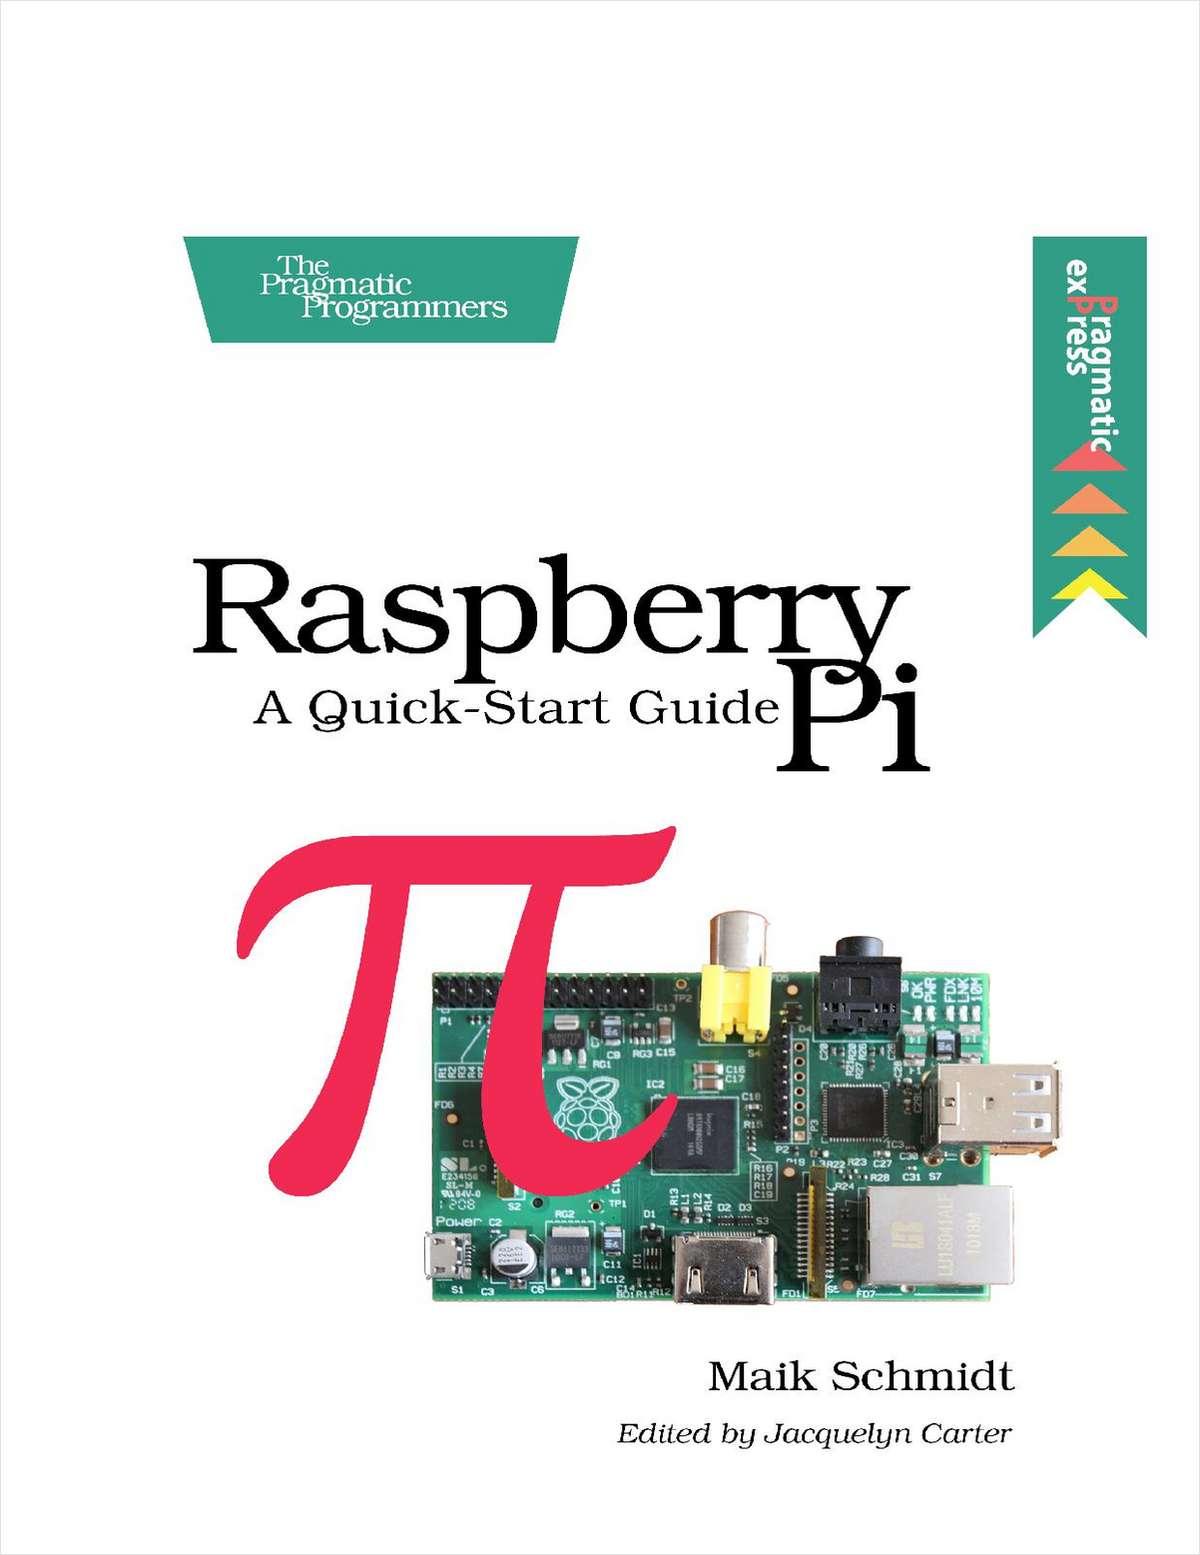 Raspberry Pi: A Quick-Start Guide (Book Excerpt) Screenshot